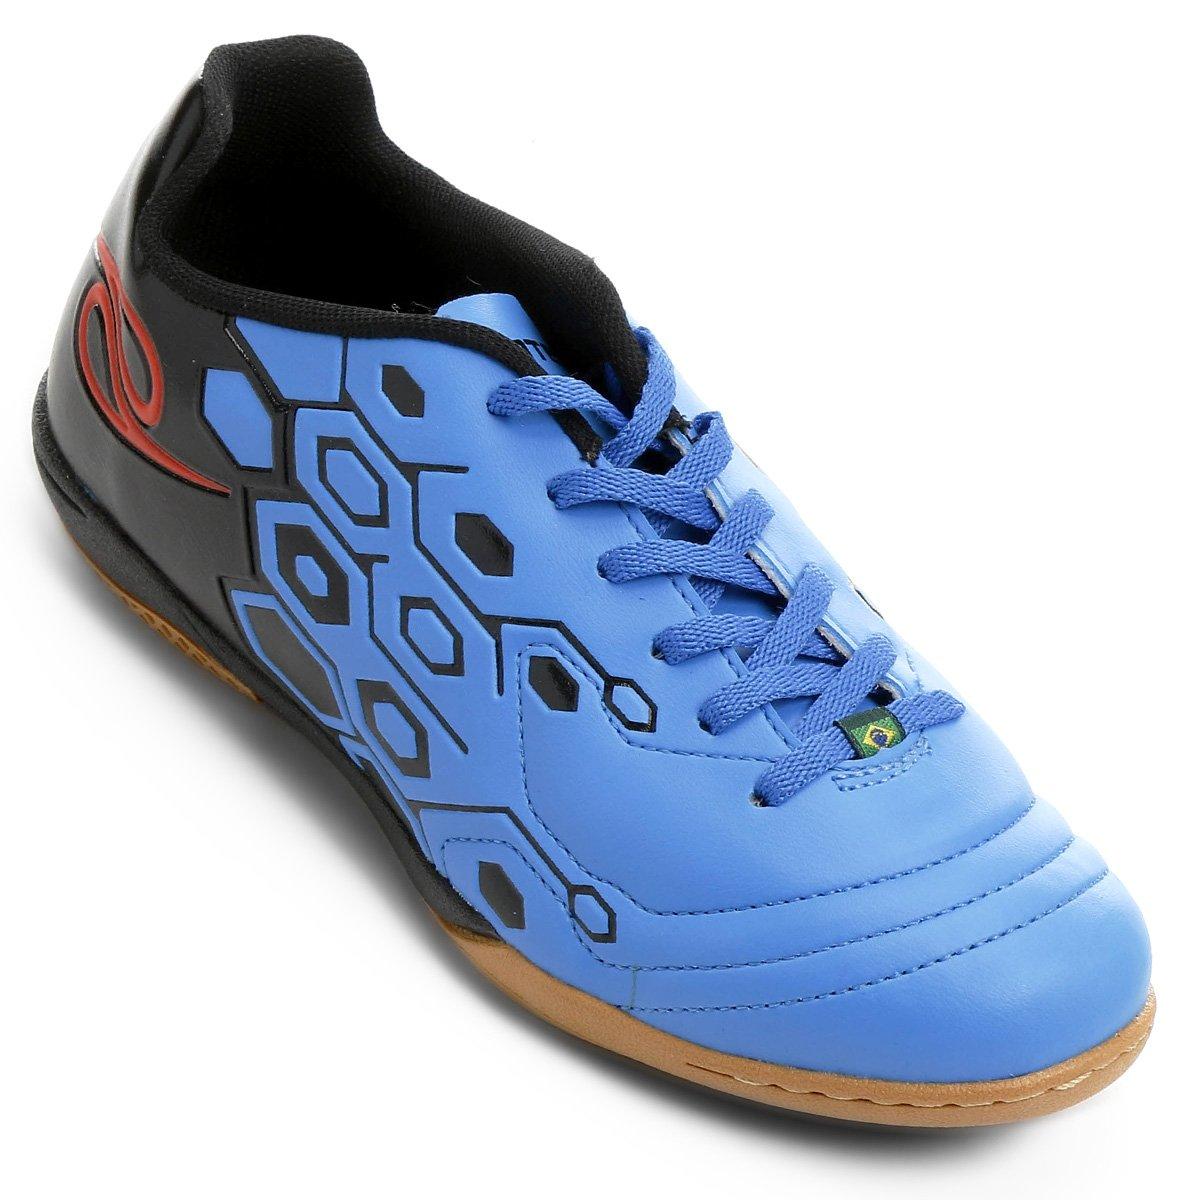 Chuteira Futsal Dalponte Cyber Masculina - Compre Agora  28aafe8d55c5b